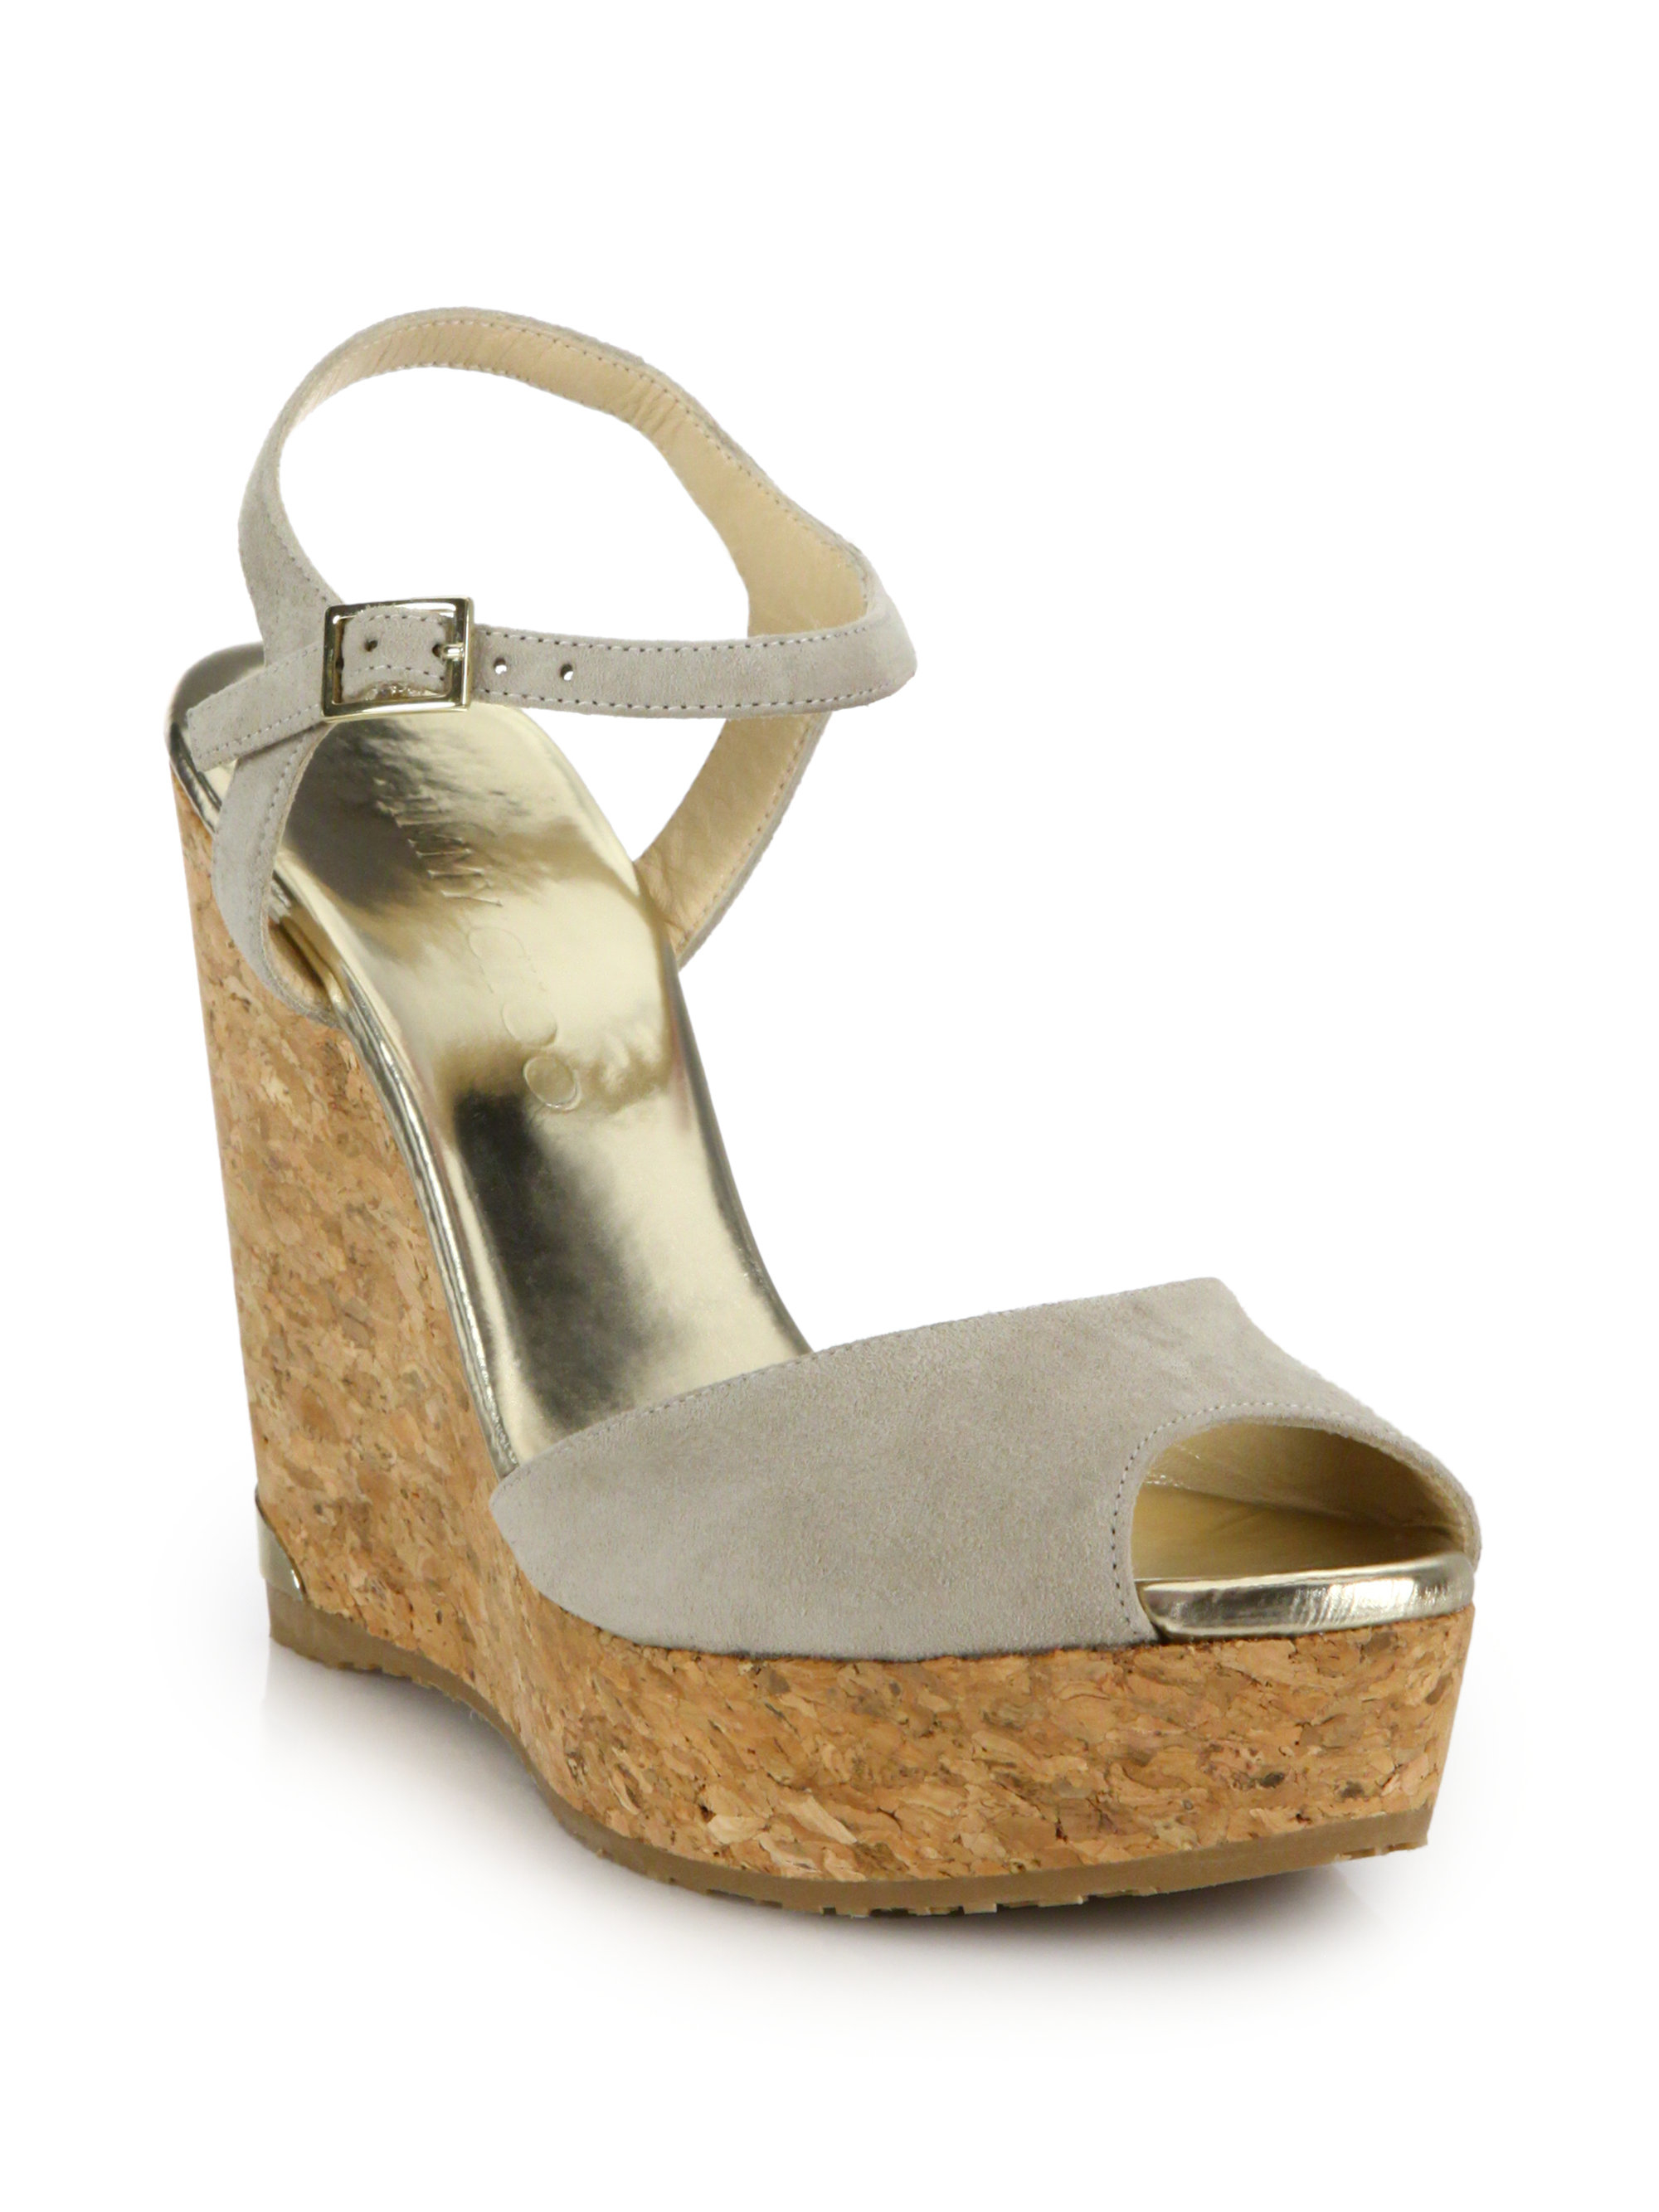 c721f61f843d Lyst - Jimmy Choo Perla Suede   Cork Platform Wedge Sandals in Natural